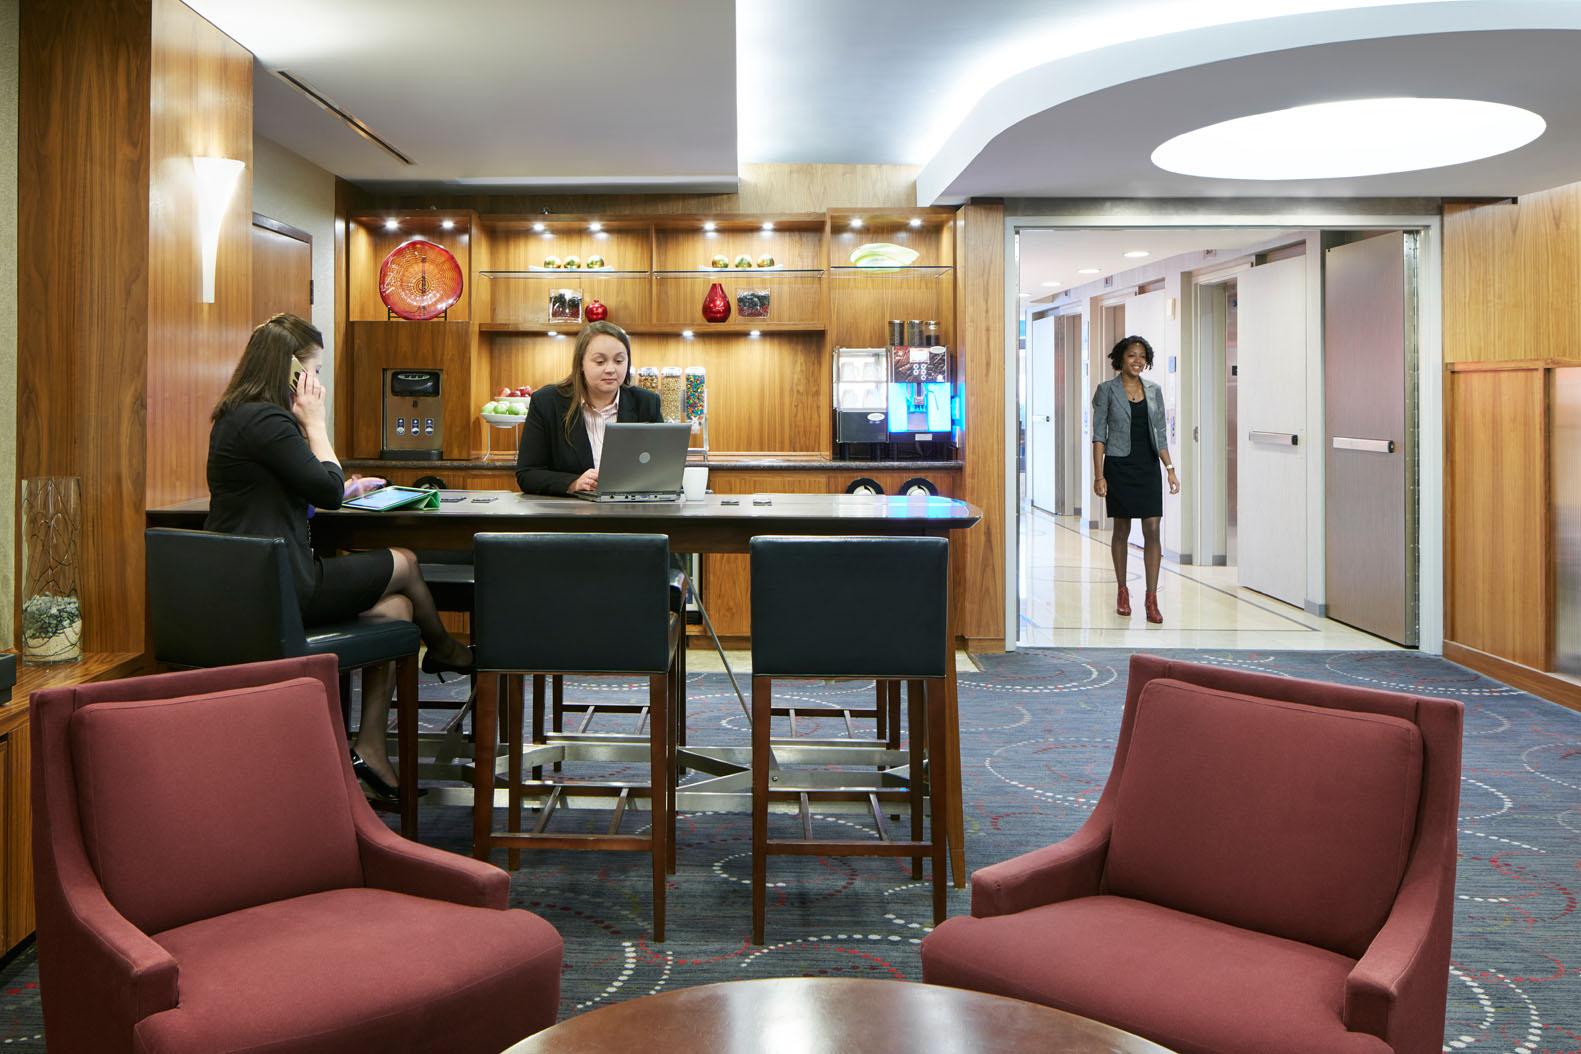 Club Quarters Hotel in San Francisco  A Business Traveler